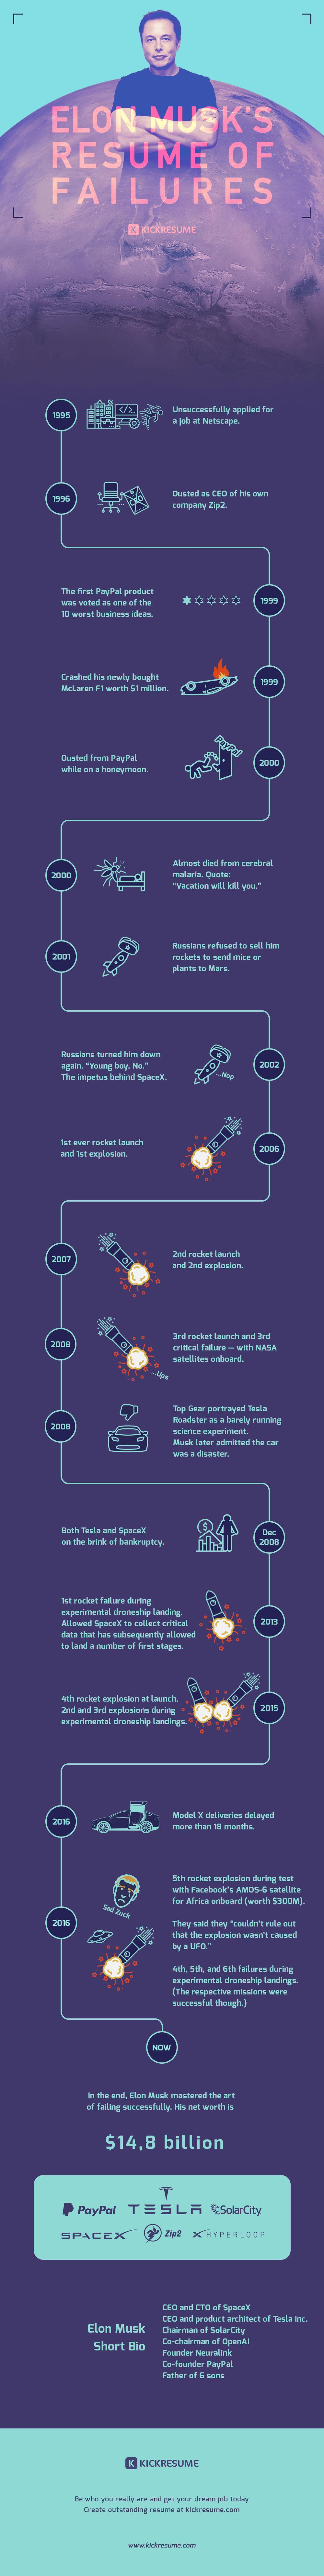 Infographic Fouten maken kan leiden tot succes